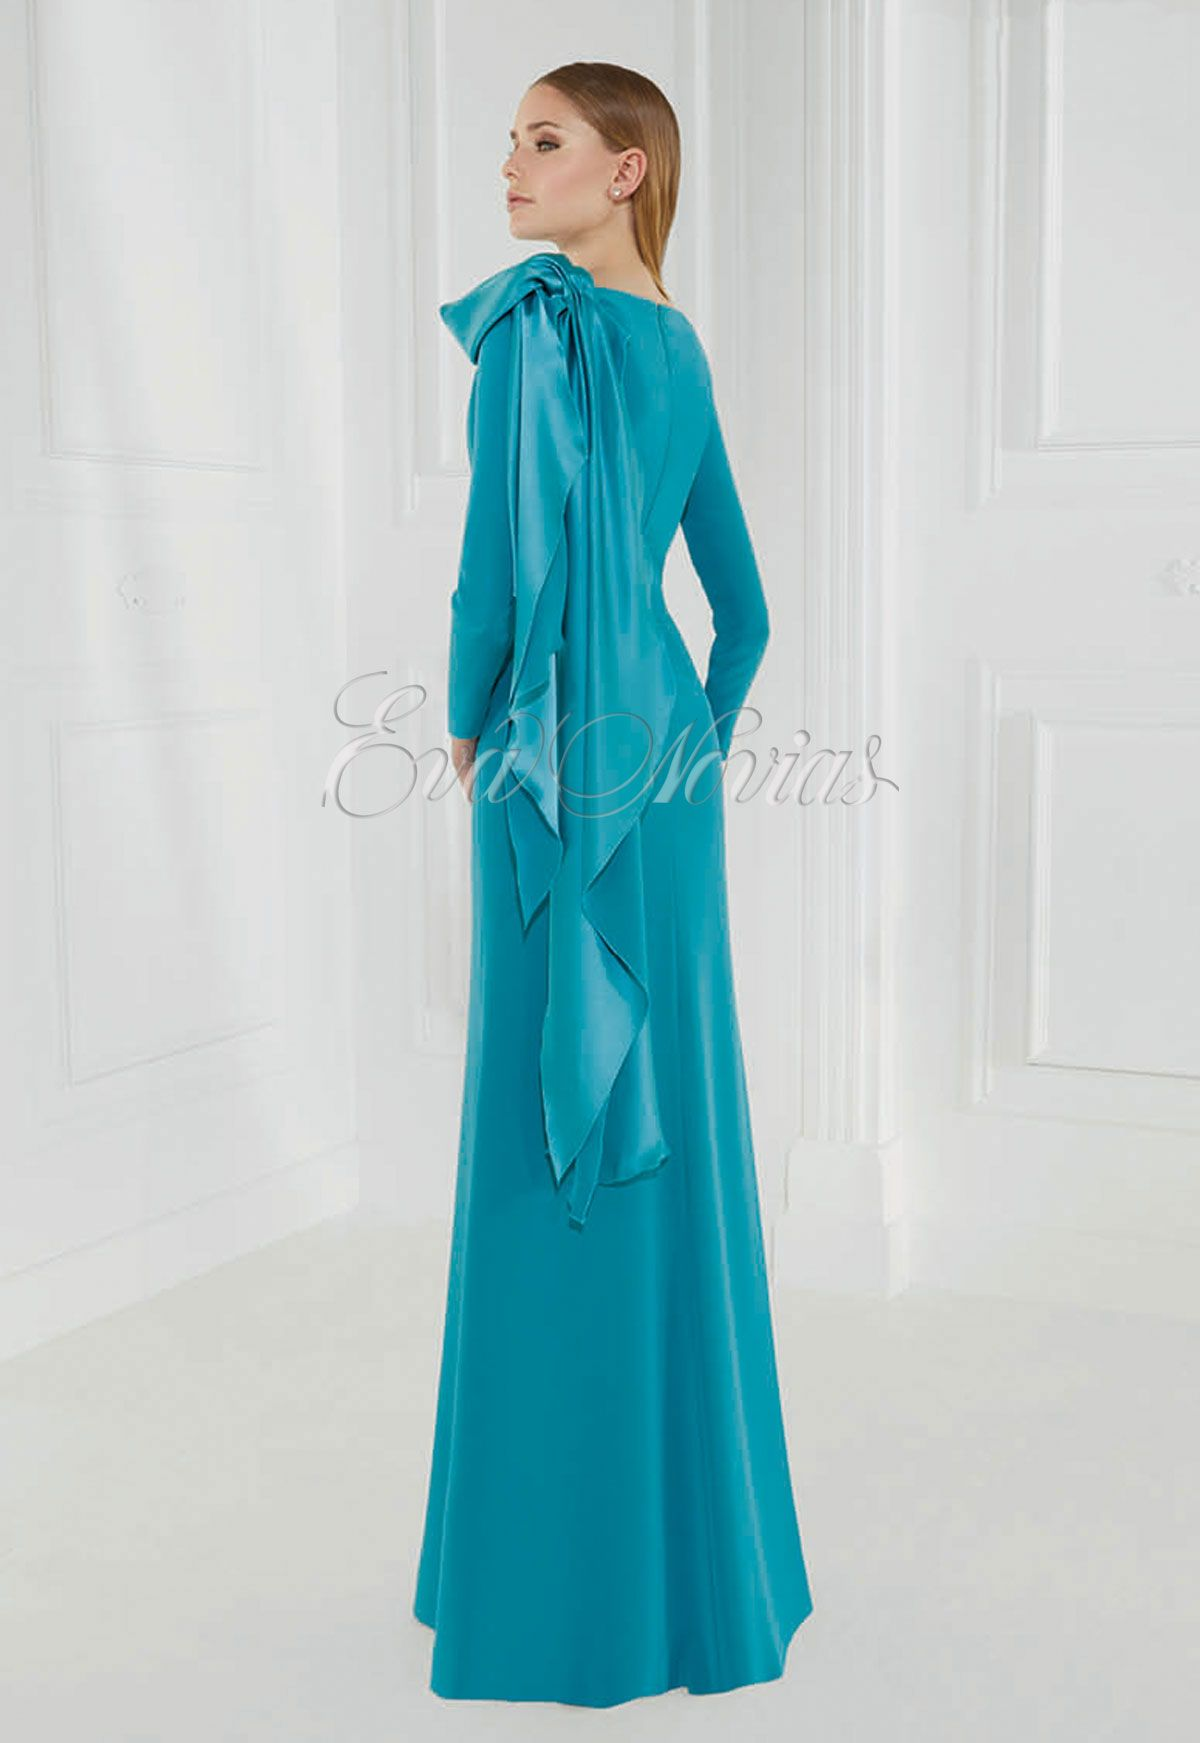 Moderno Vestido De Novia 1930 Composición - Ideas de Estilos de ...